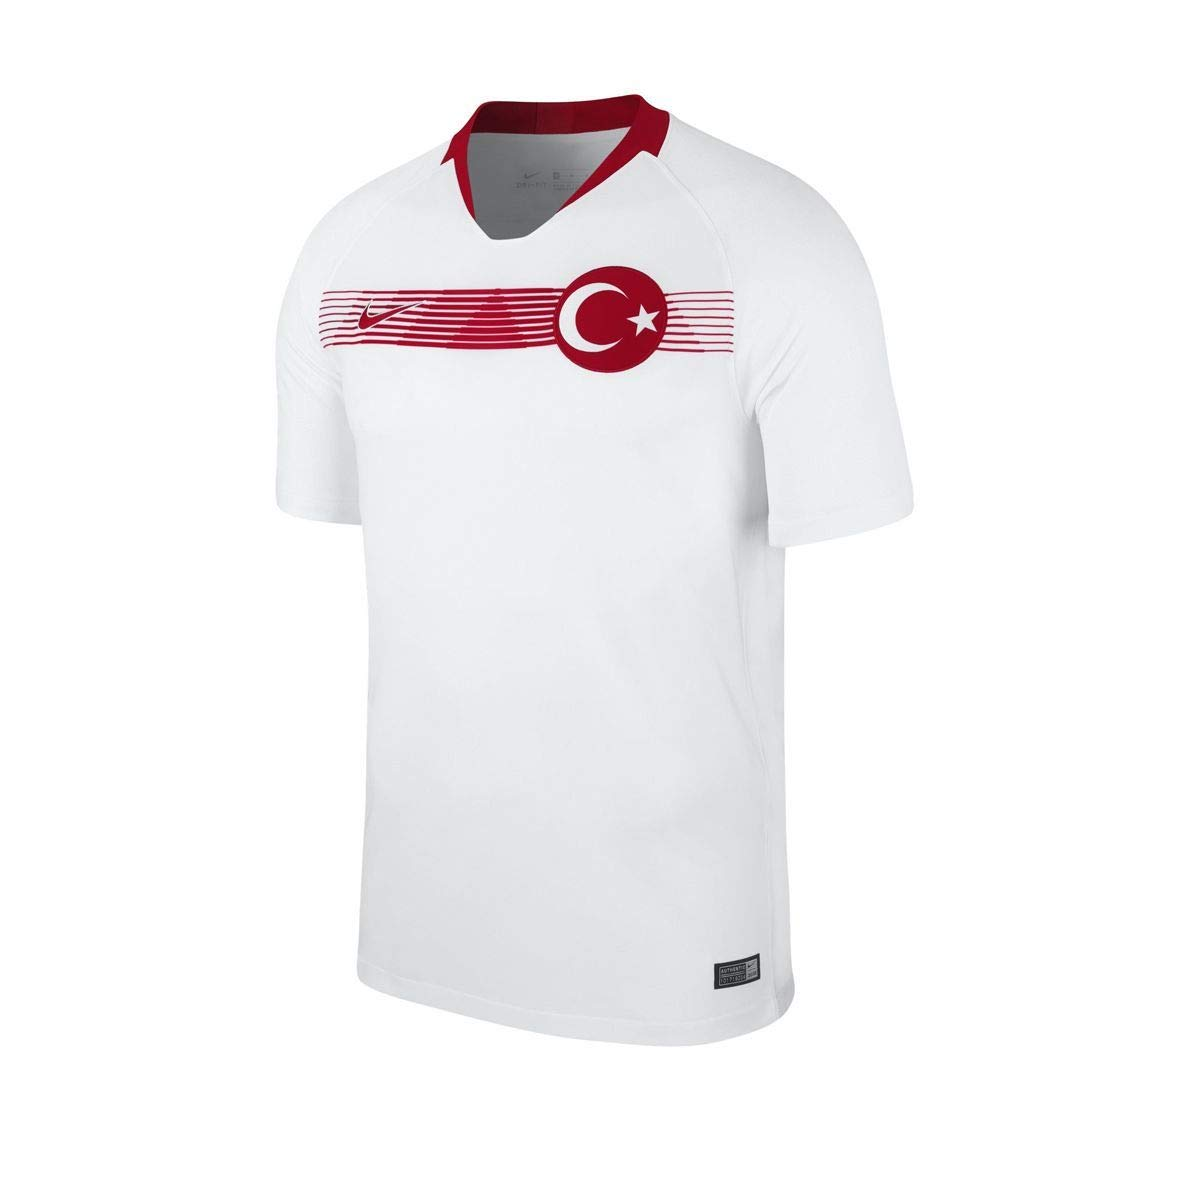 6fa01bfa1ae Nike 2018-2019 Turkey Away Football Soccer T-Shirt Jersey